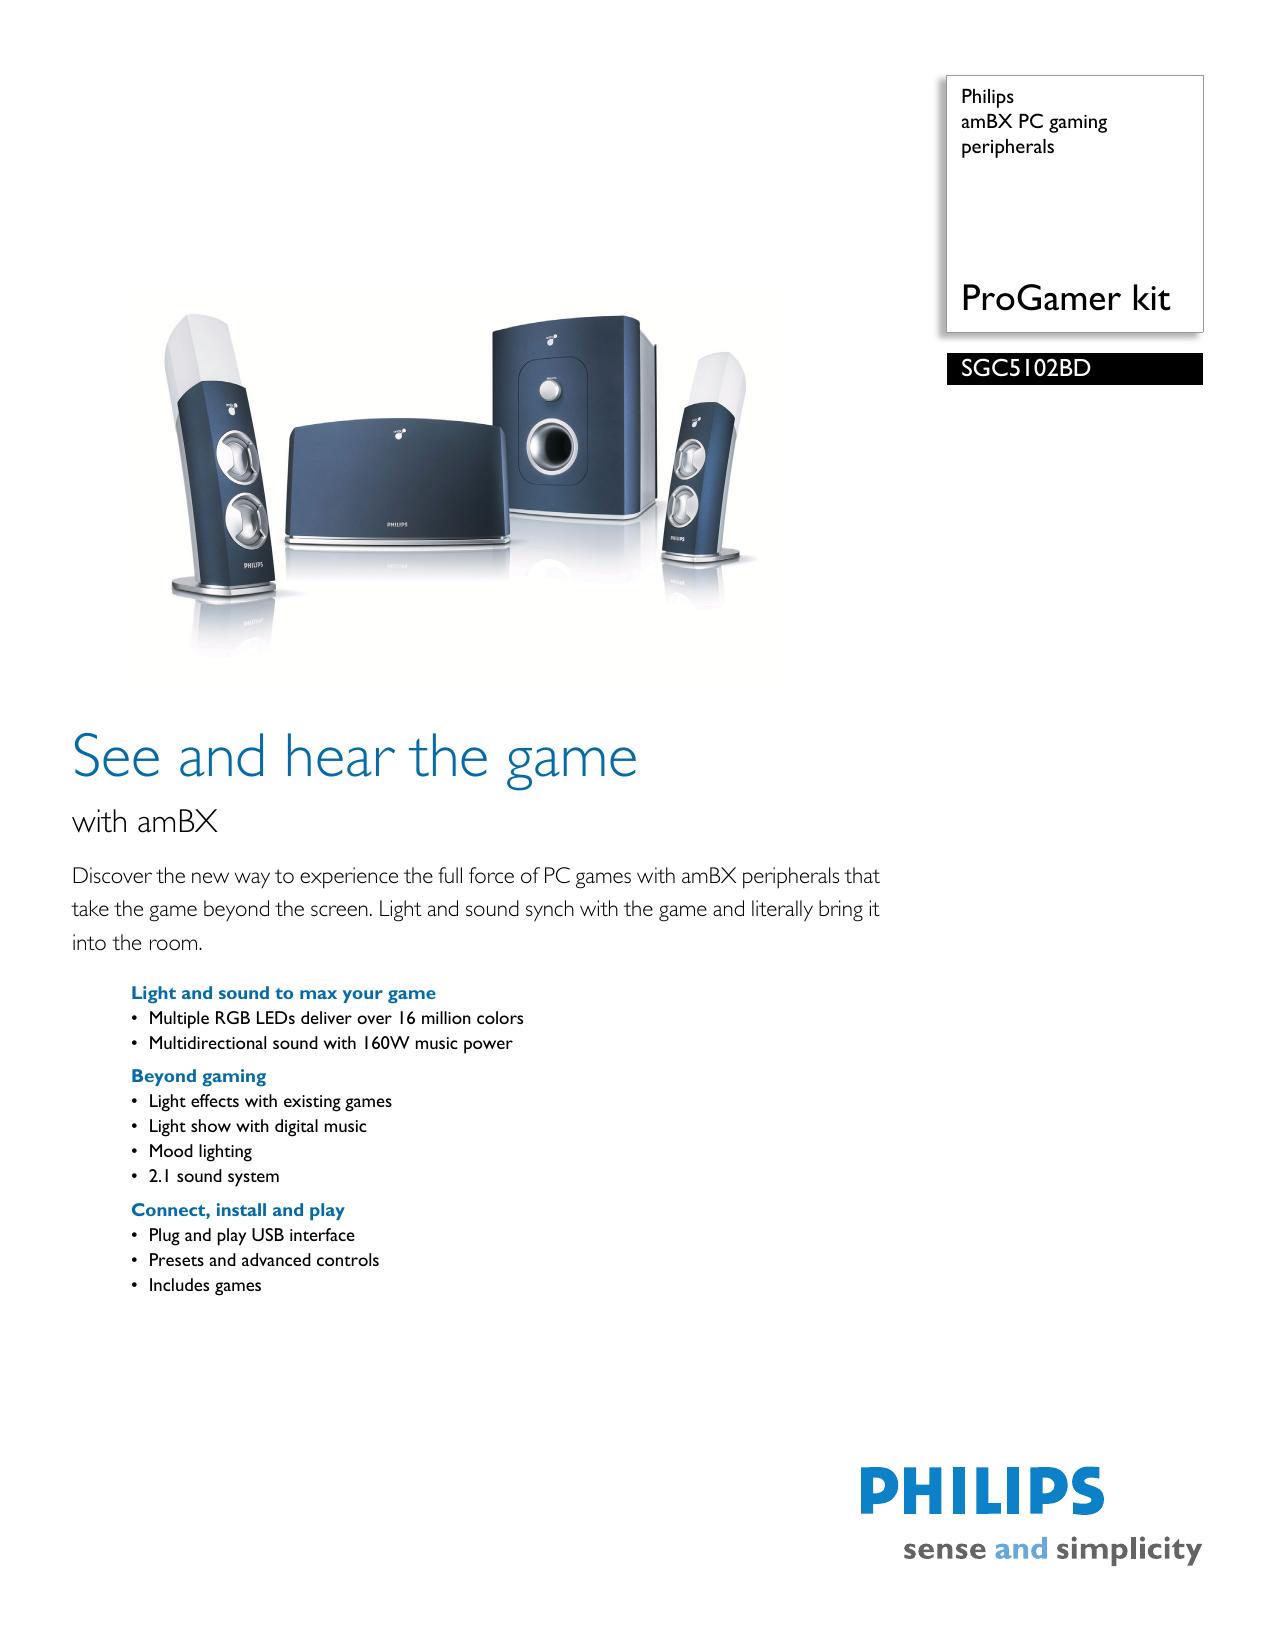 SGC5102BD/17 Philips amBX PC gaming peripherals | manualzz com